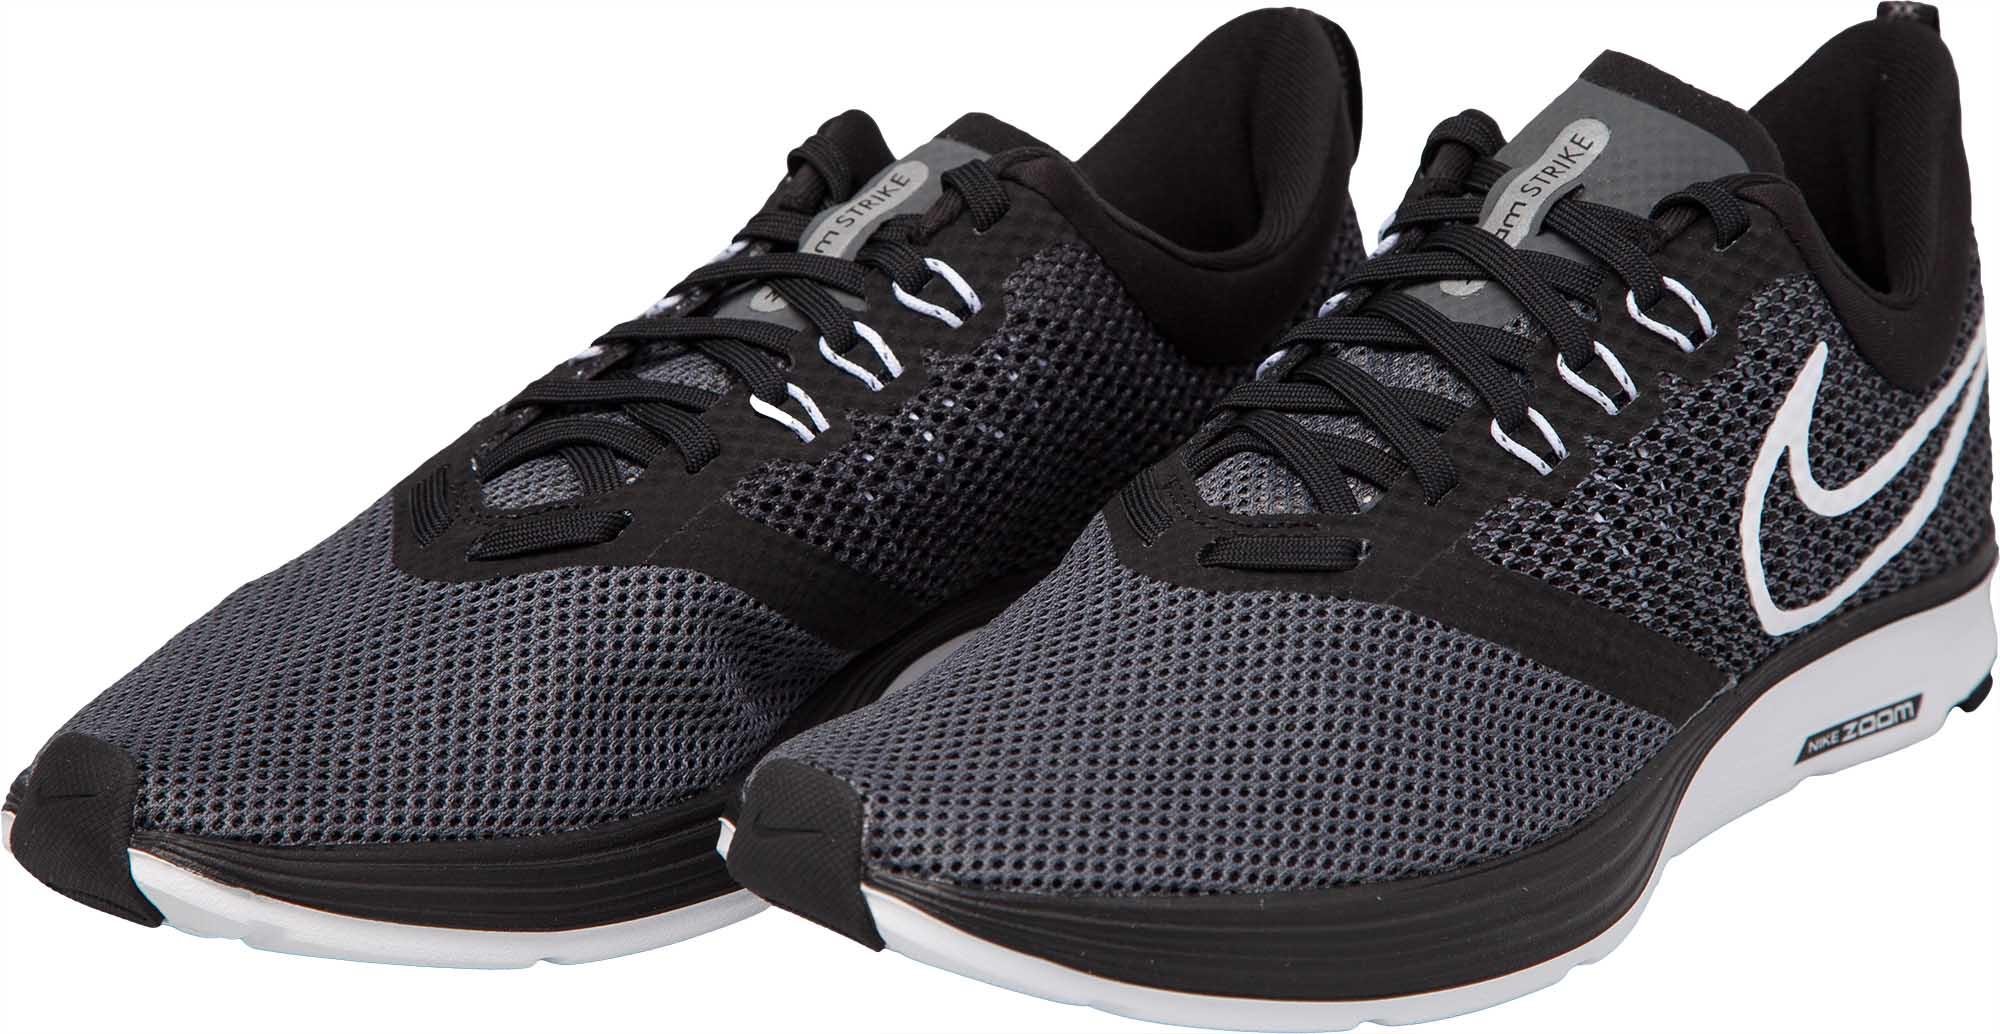 Nike ZOOM STRIKE W. Dámska bežecká obuv. Dámska bežecká obuv c482b2ace68